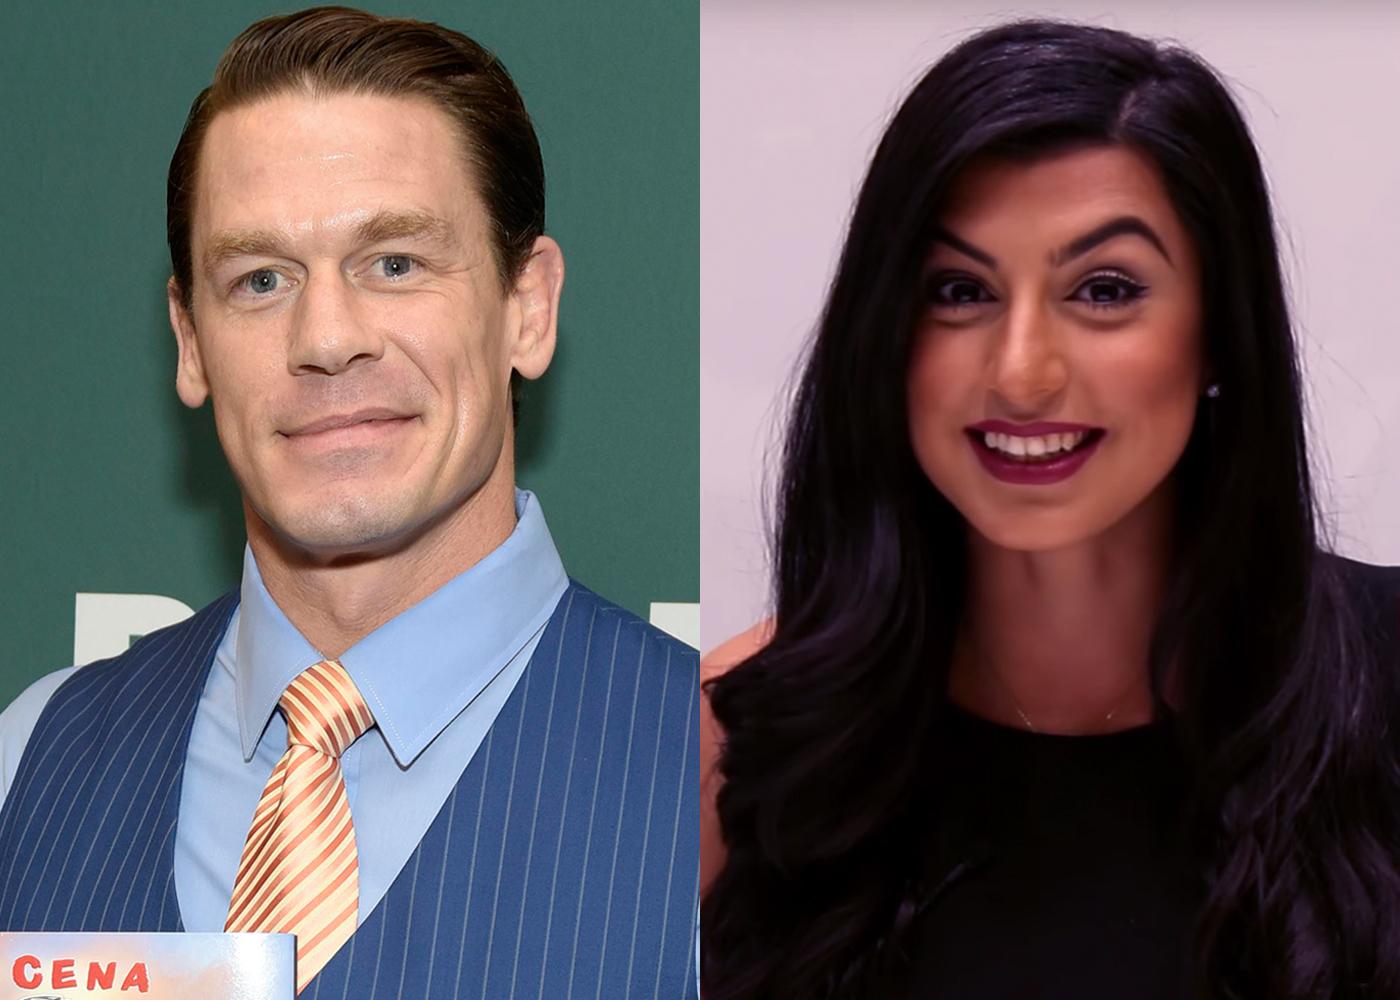 John Cenas New Girlfriend Celeb Love News For Early April 2019